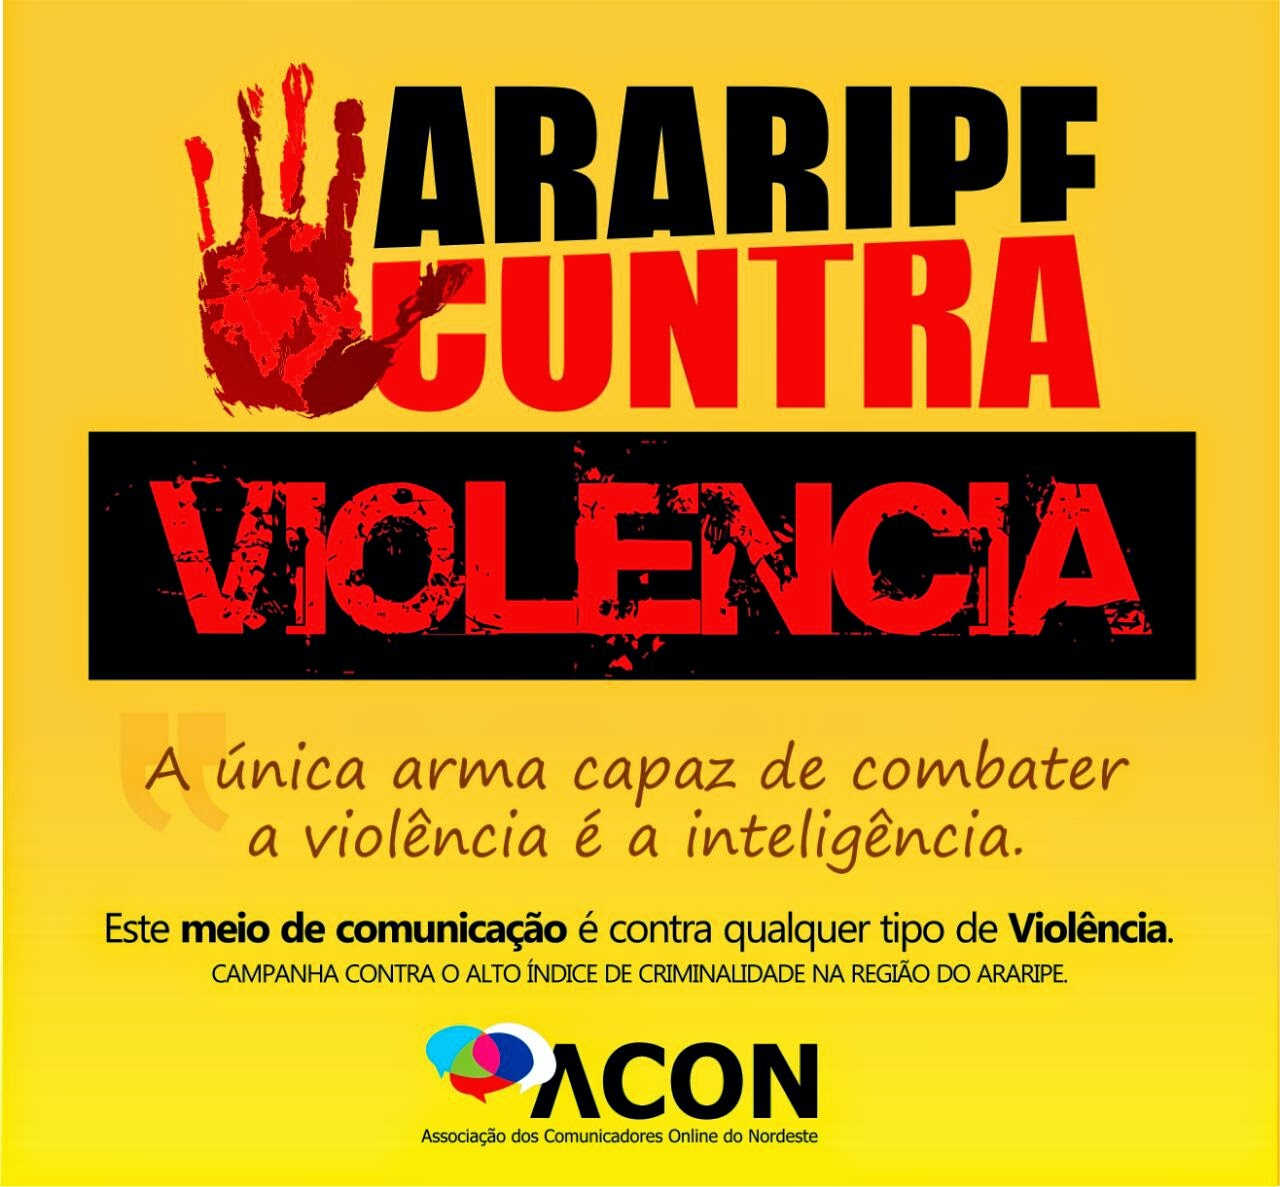 ARARIPE CONTRA A VIOLÊNCIA